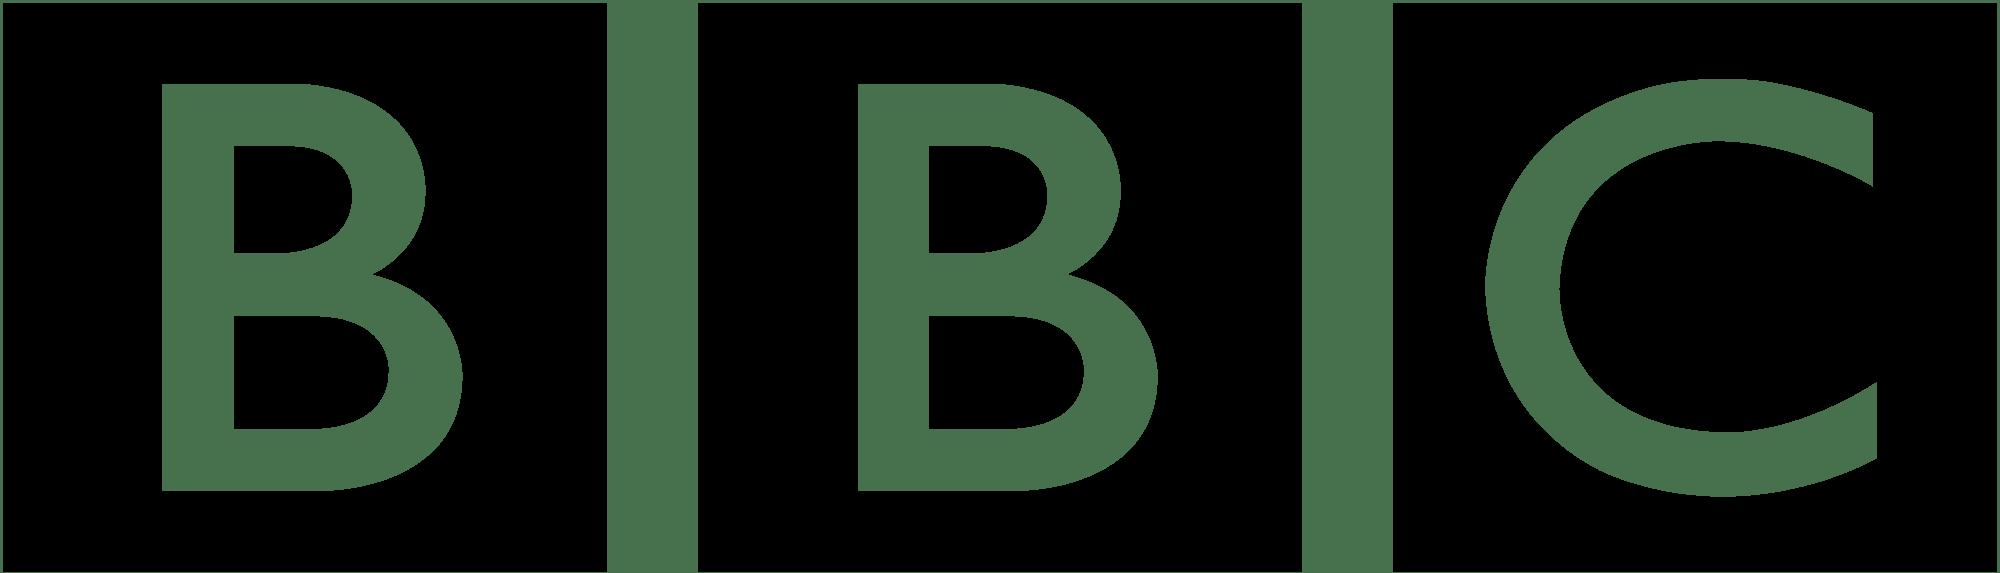 Bbc Logo transparent PNG.